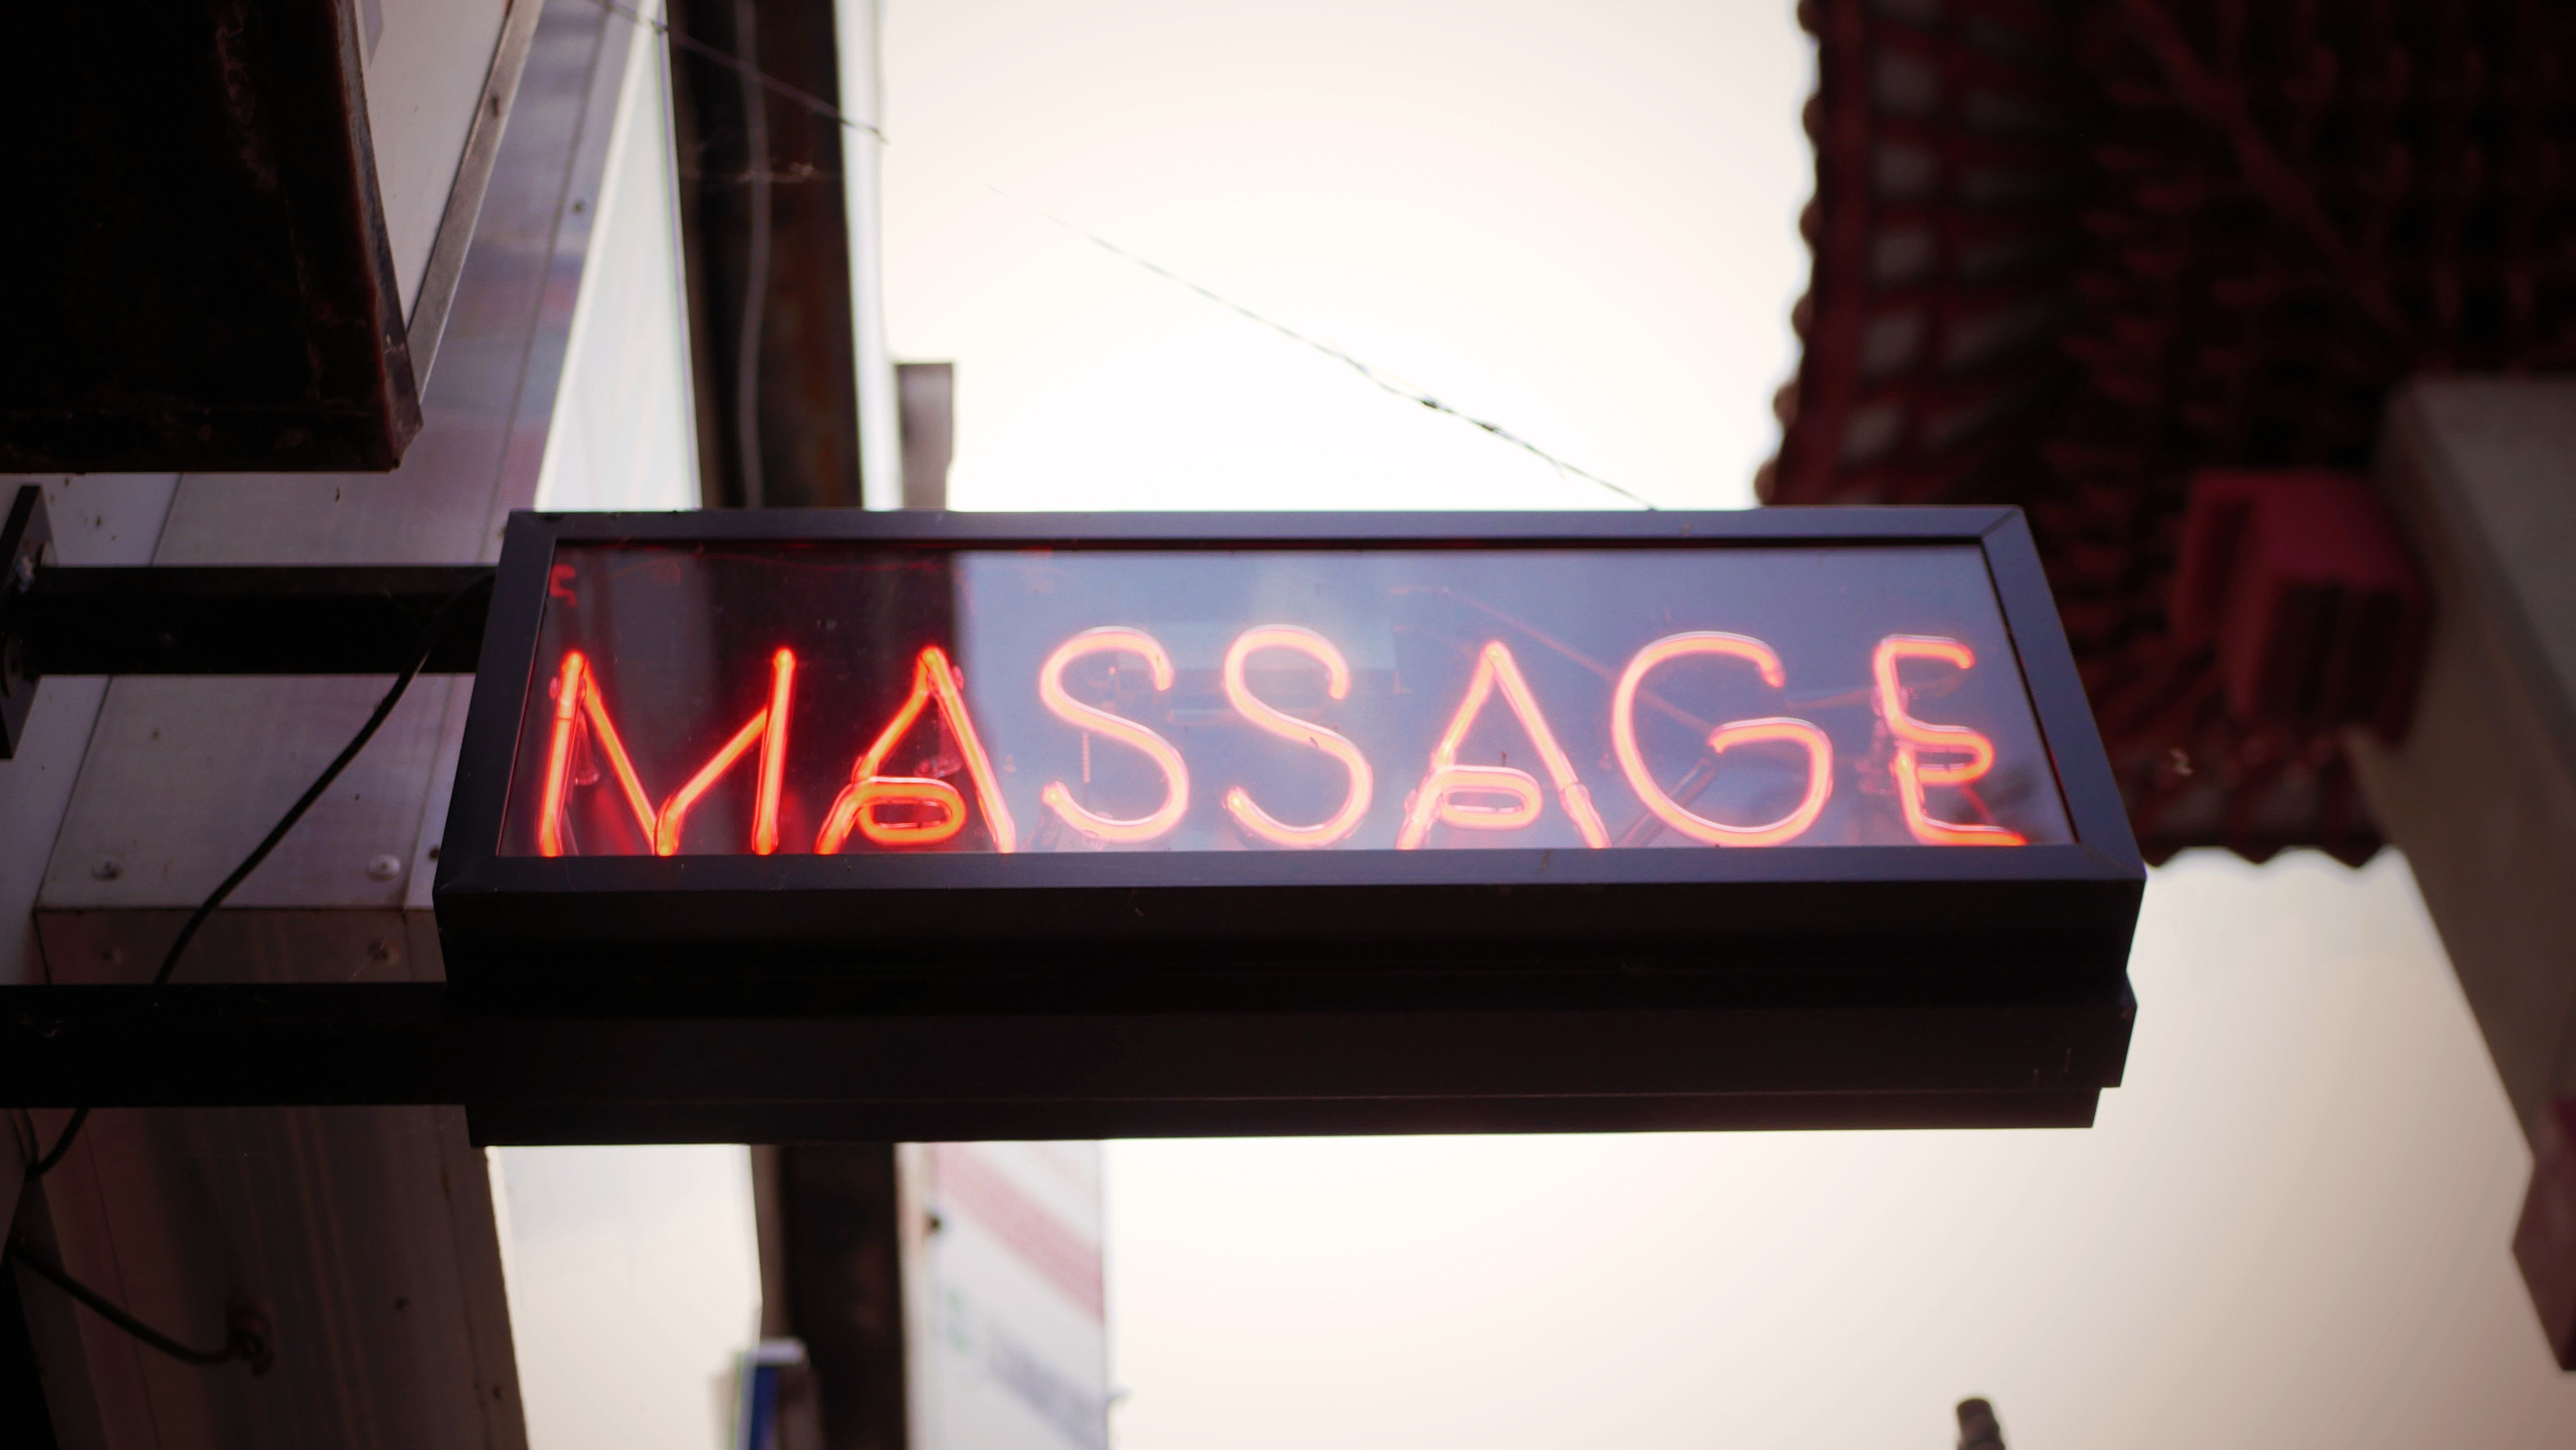 asian massage adult services